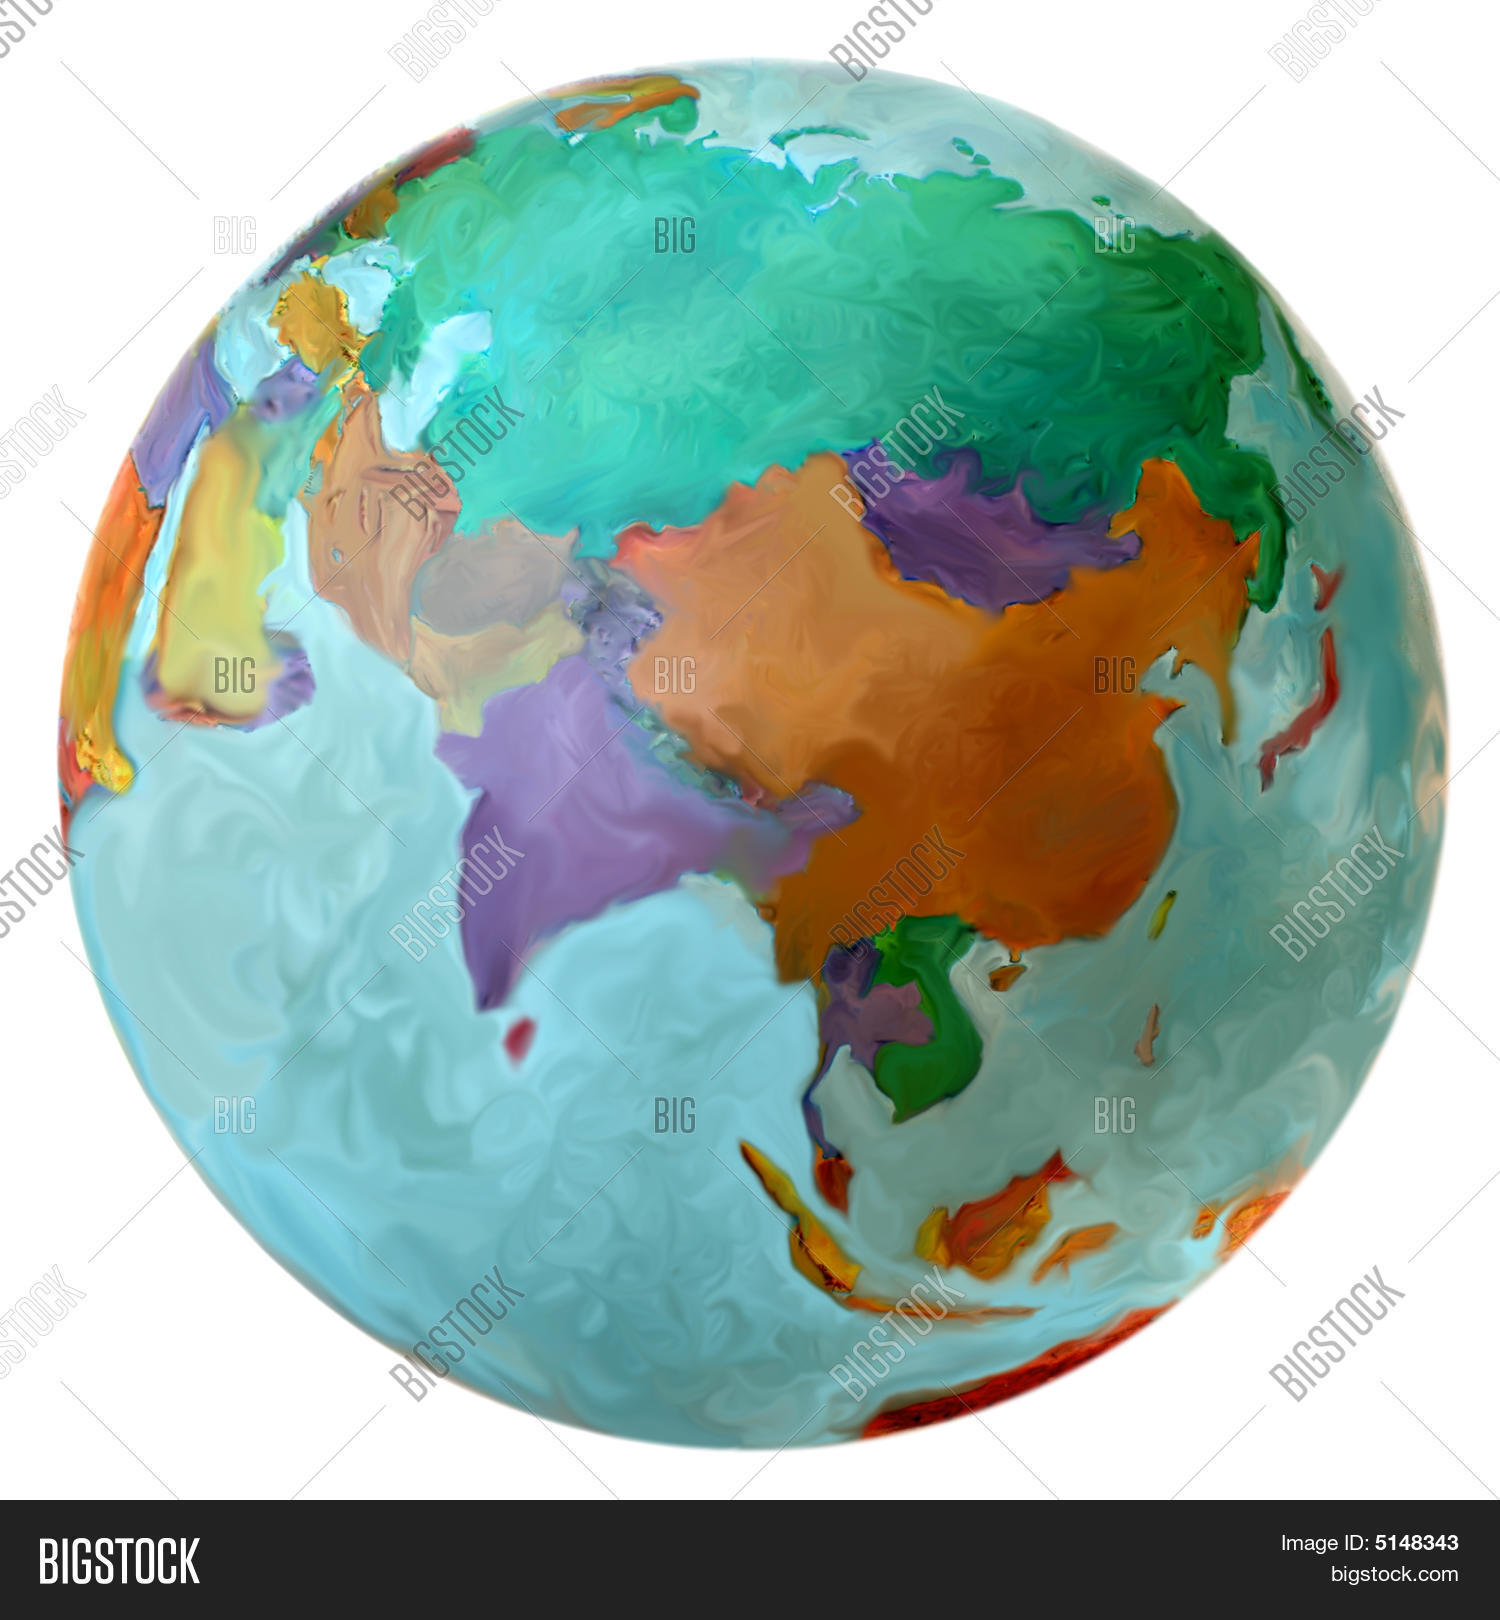 Eastern hemisphere on image photo free trial bigstock eastern hemisphere on the world globe middle east russia asia gumiabroncs Images